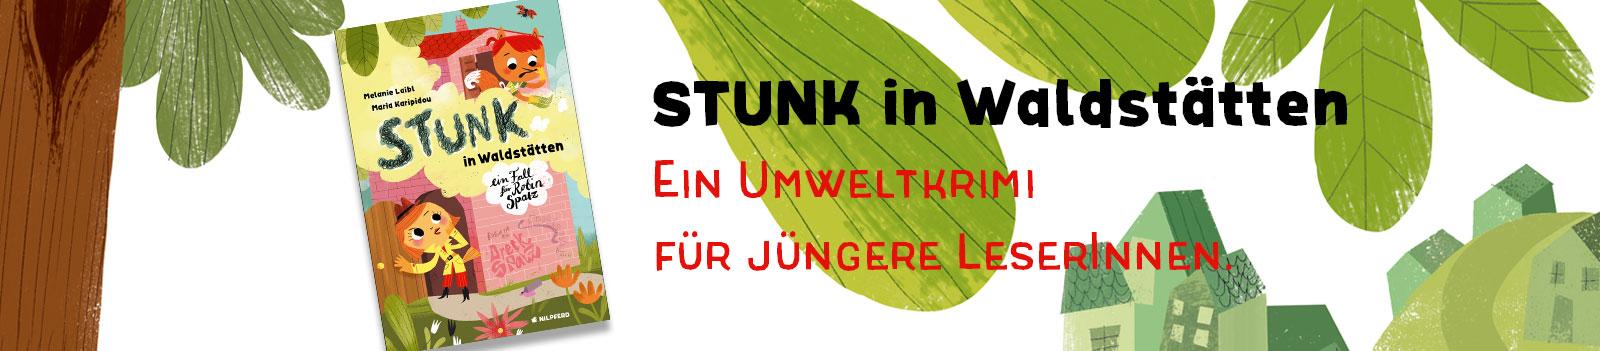 Stunk in Waldstätten